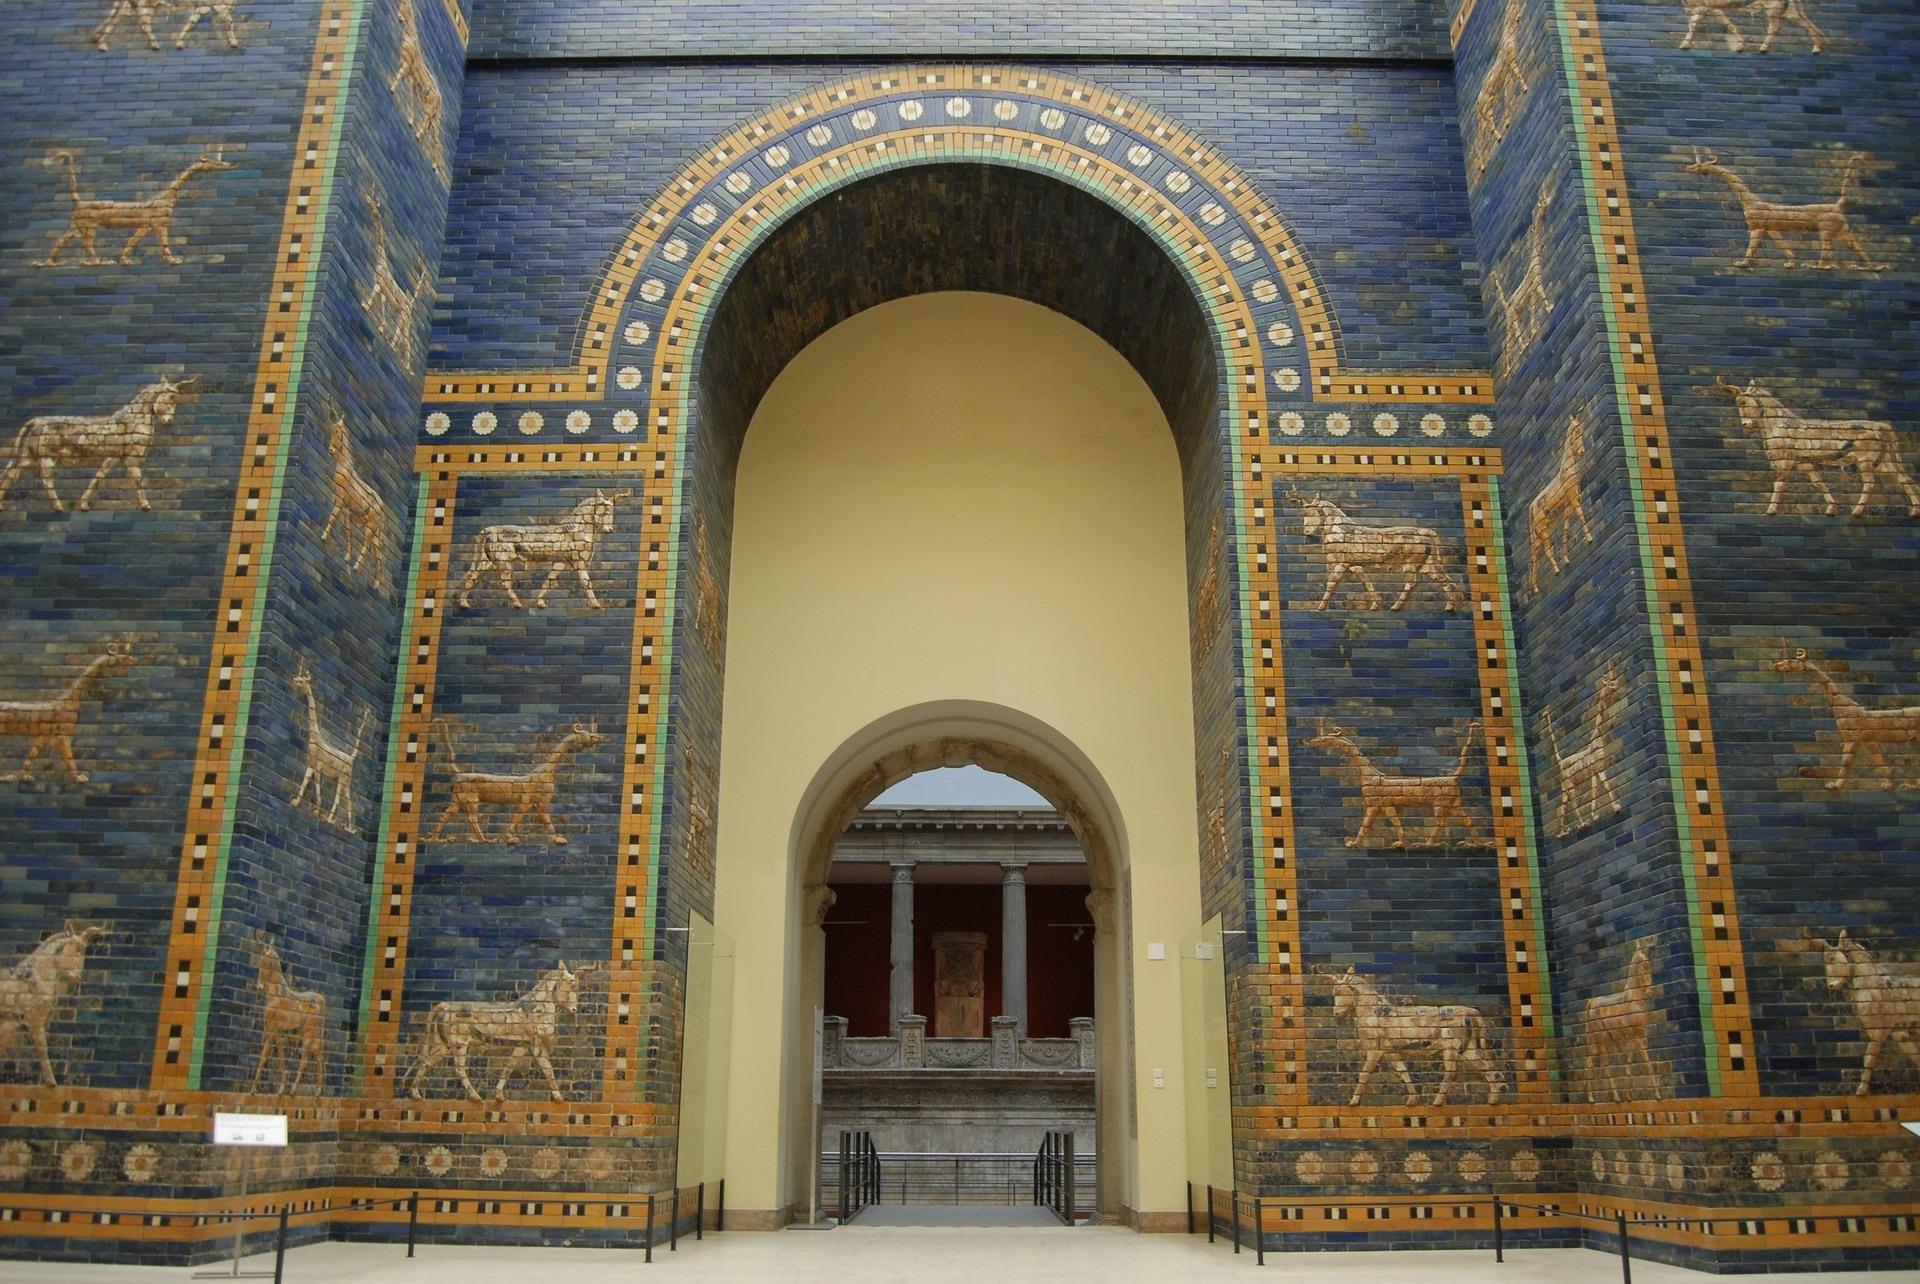 pergamon_museum_berlin_germany